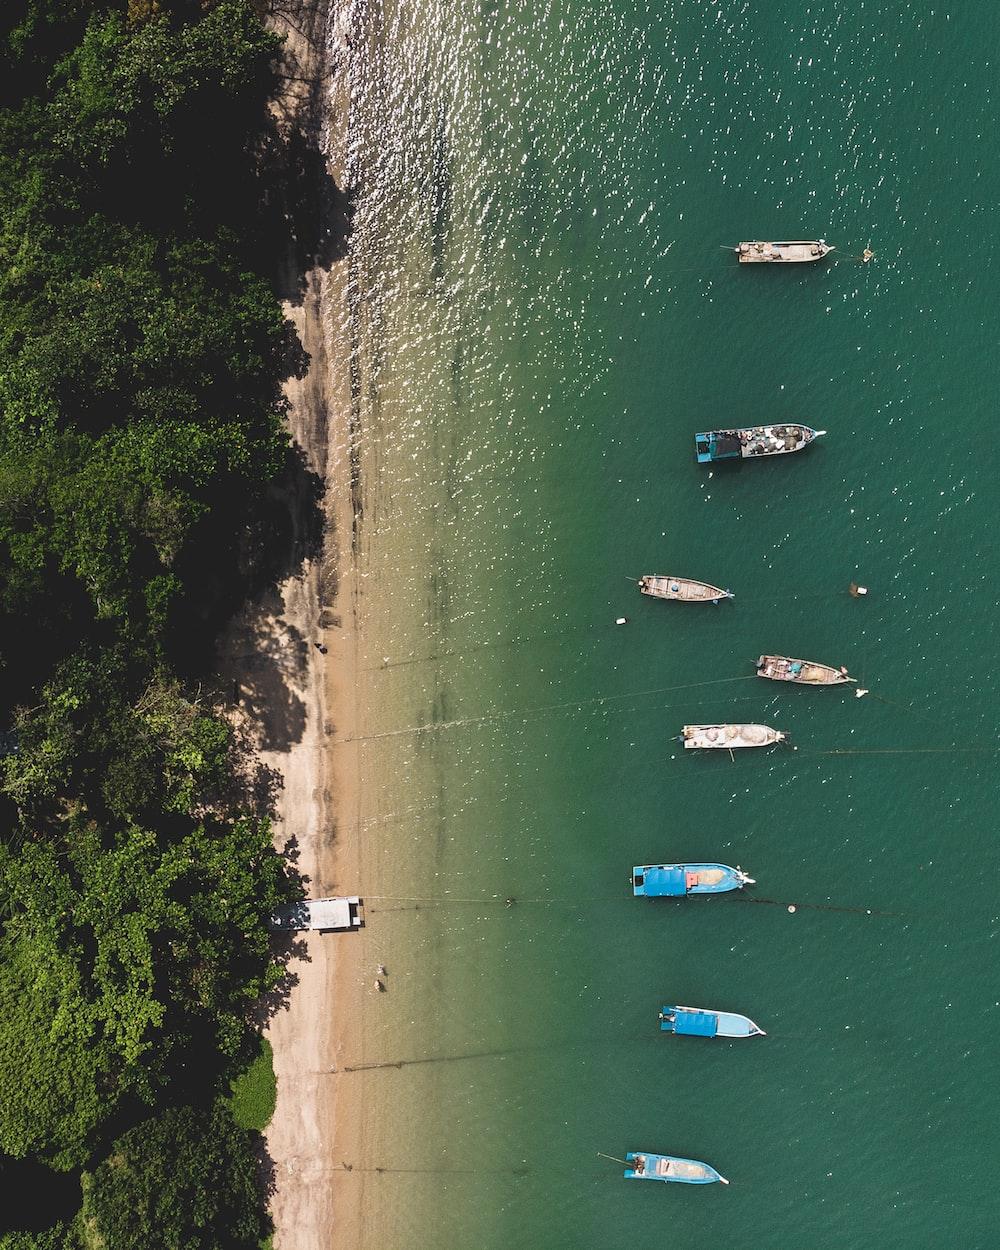 aerial photography of boats near white sand beachg